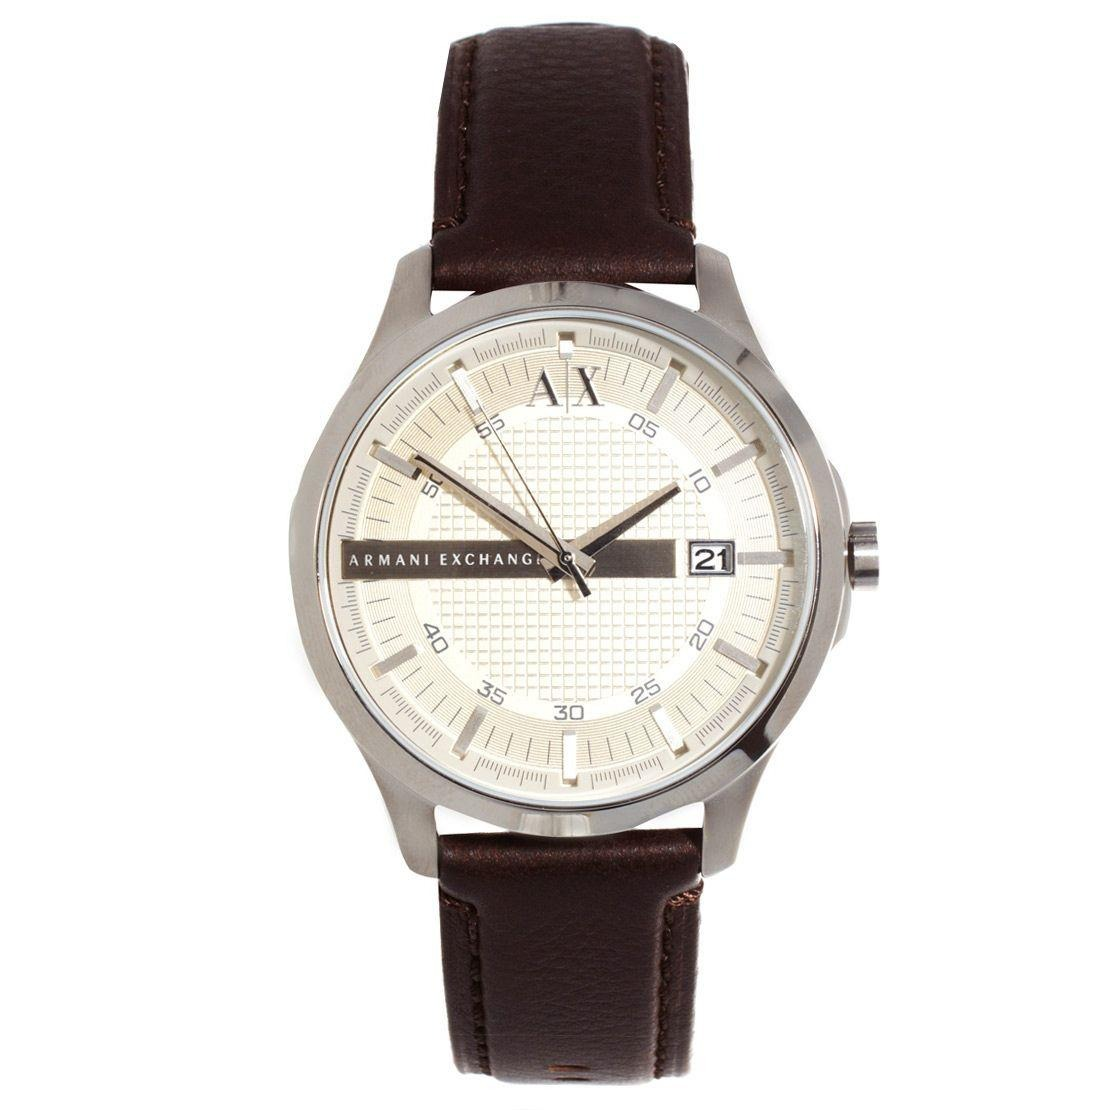 27d6b7d0ed2 Relógio Masculino Armani Exchange Ax2100 0kn Couro Marrom - R  577 ...